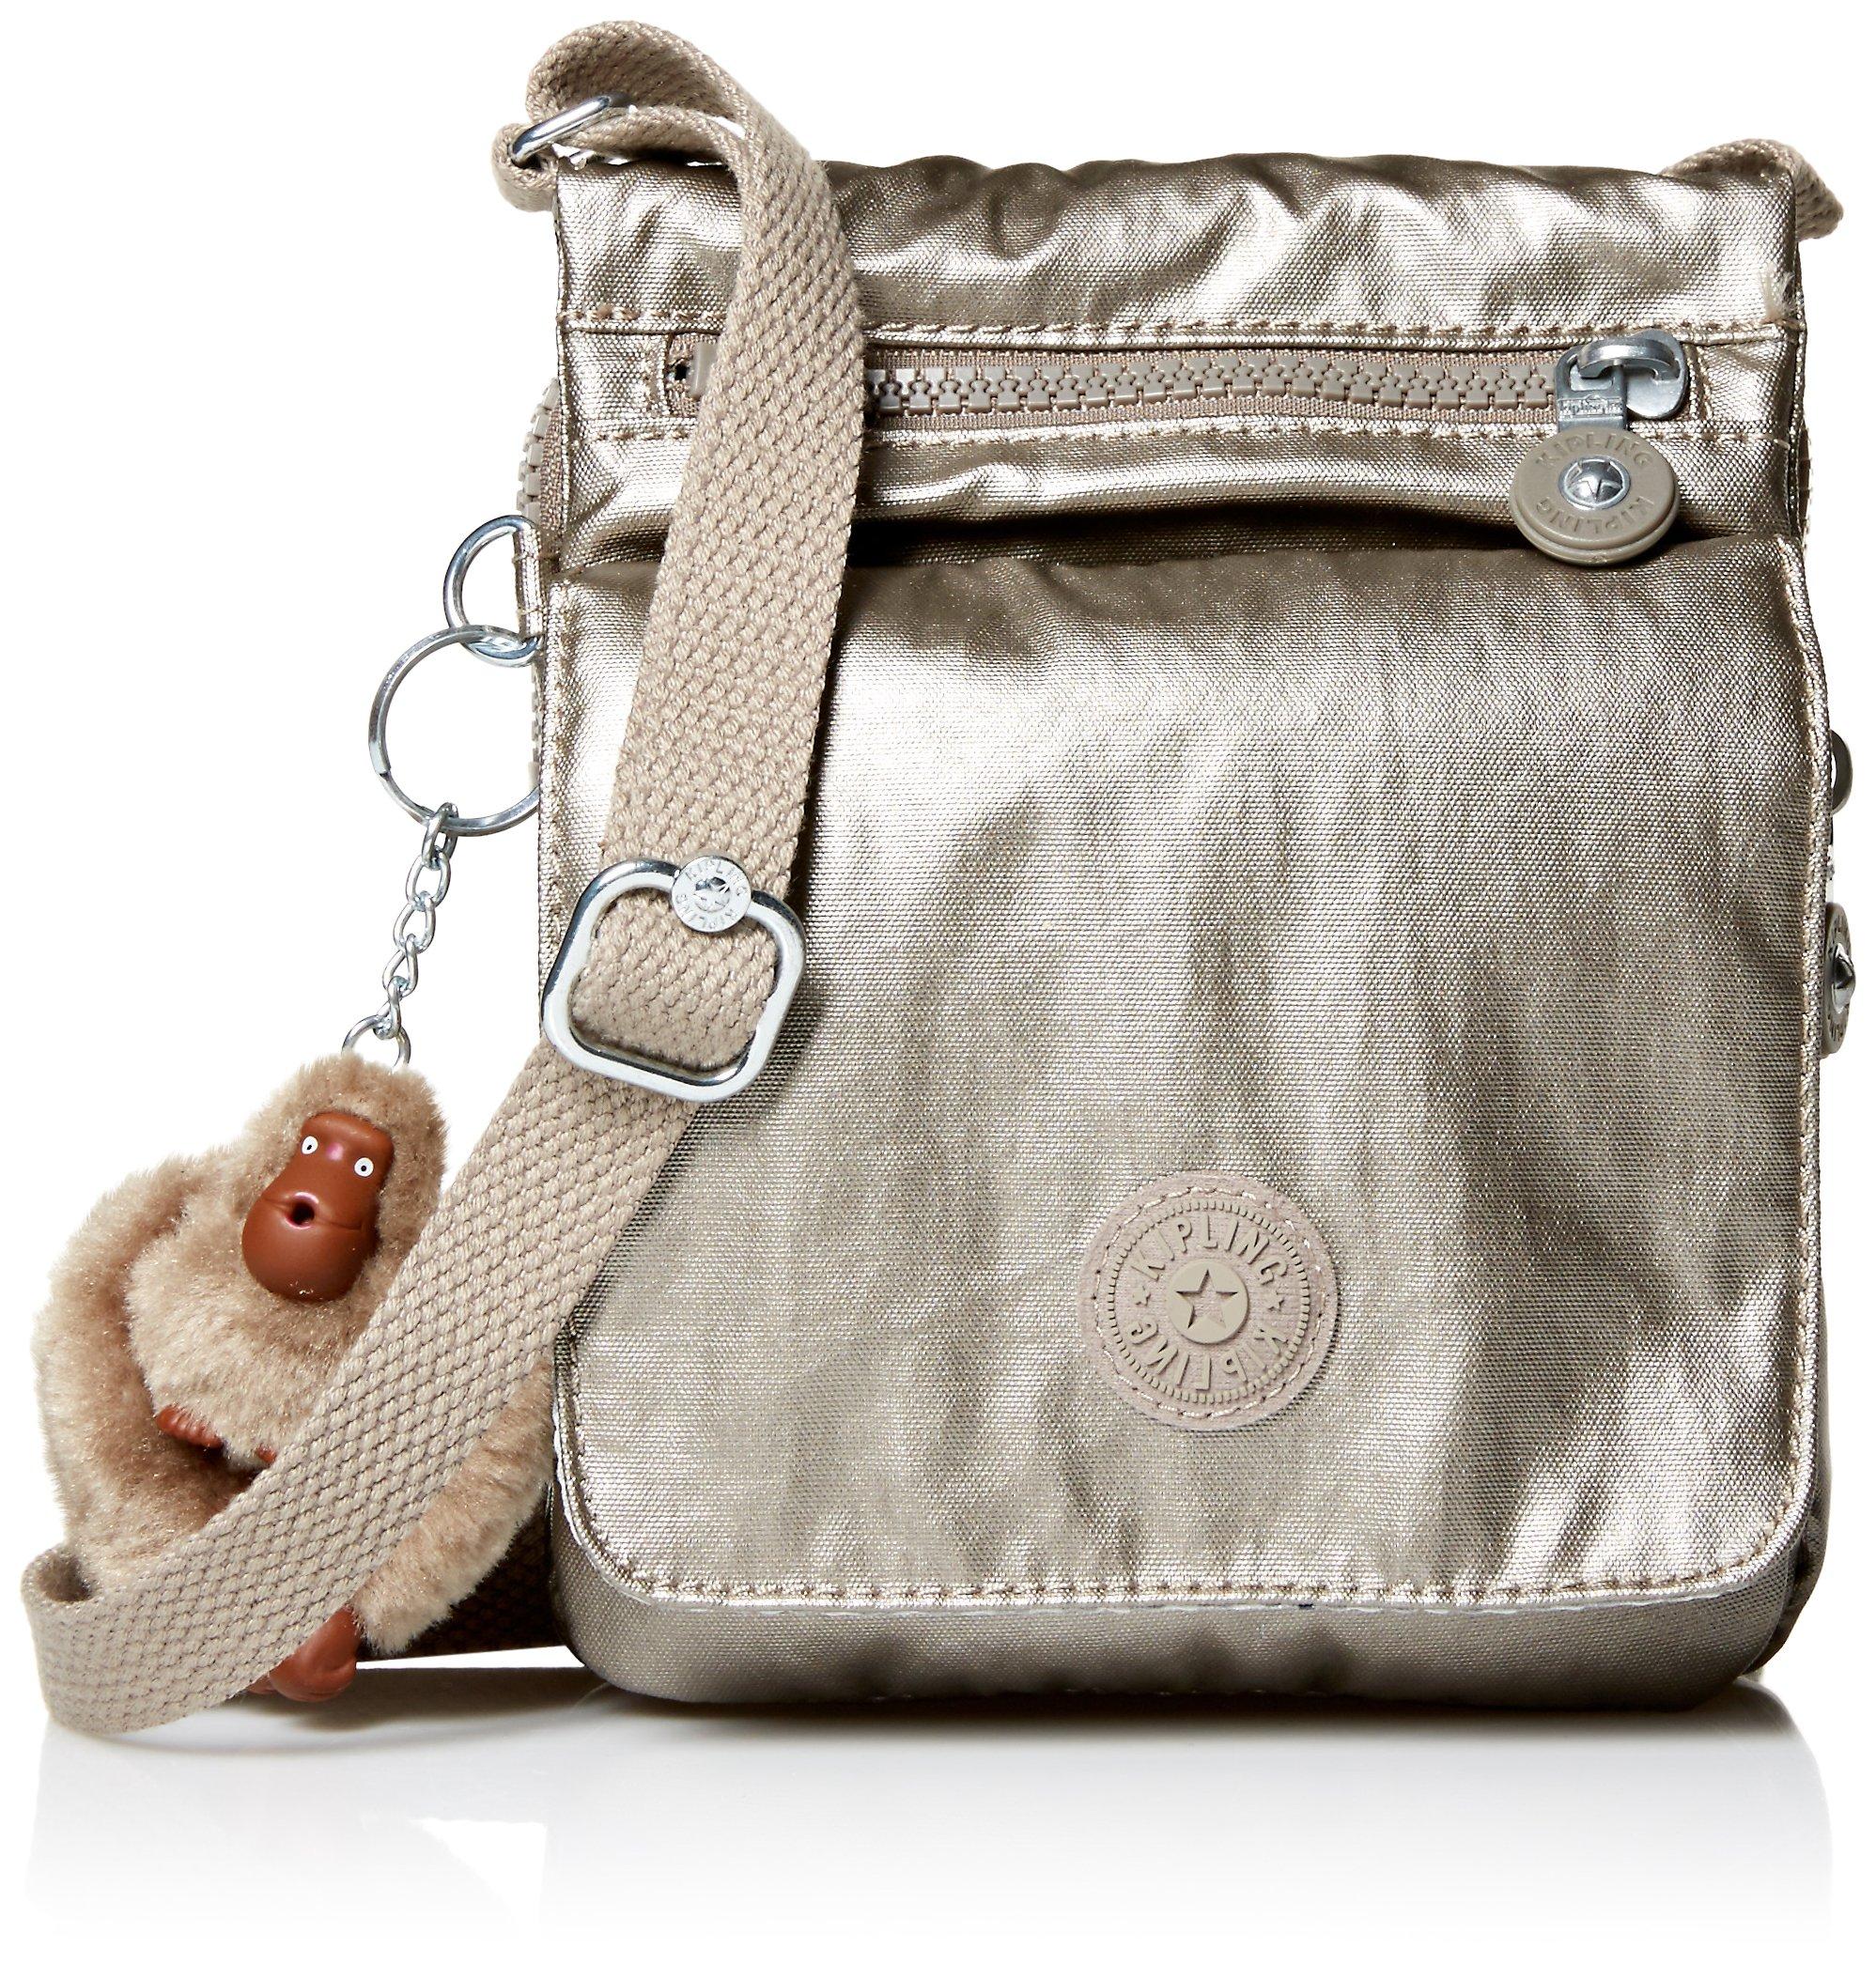 Kipling El Dorado Crossbody Essential Travel Bag, Metallic Pewter